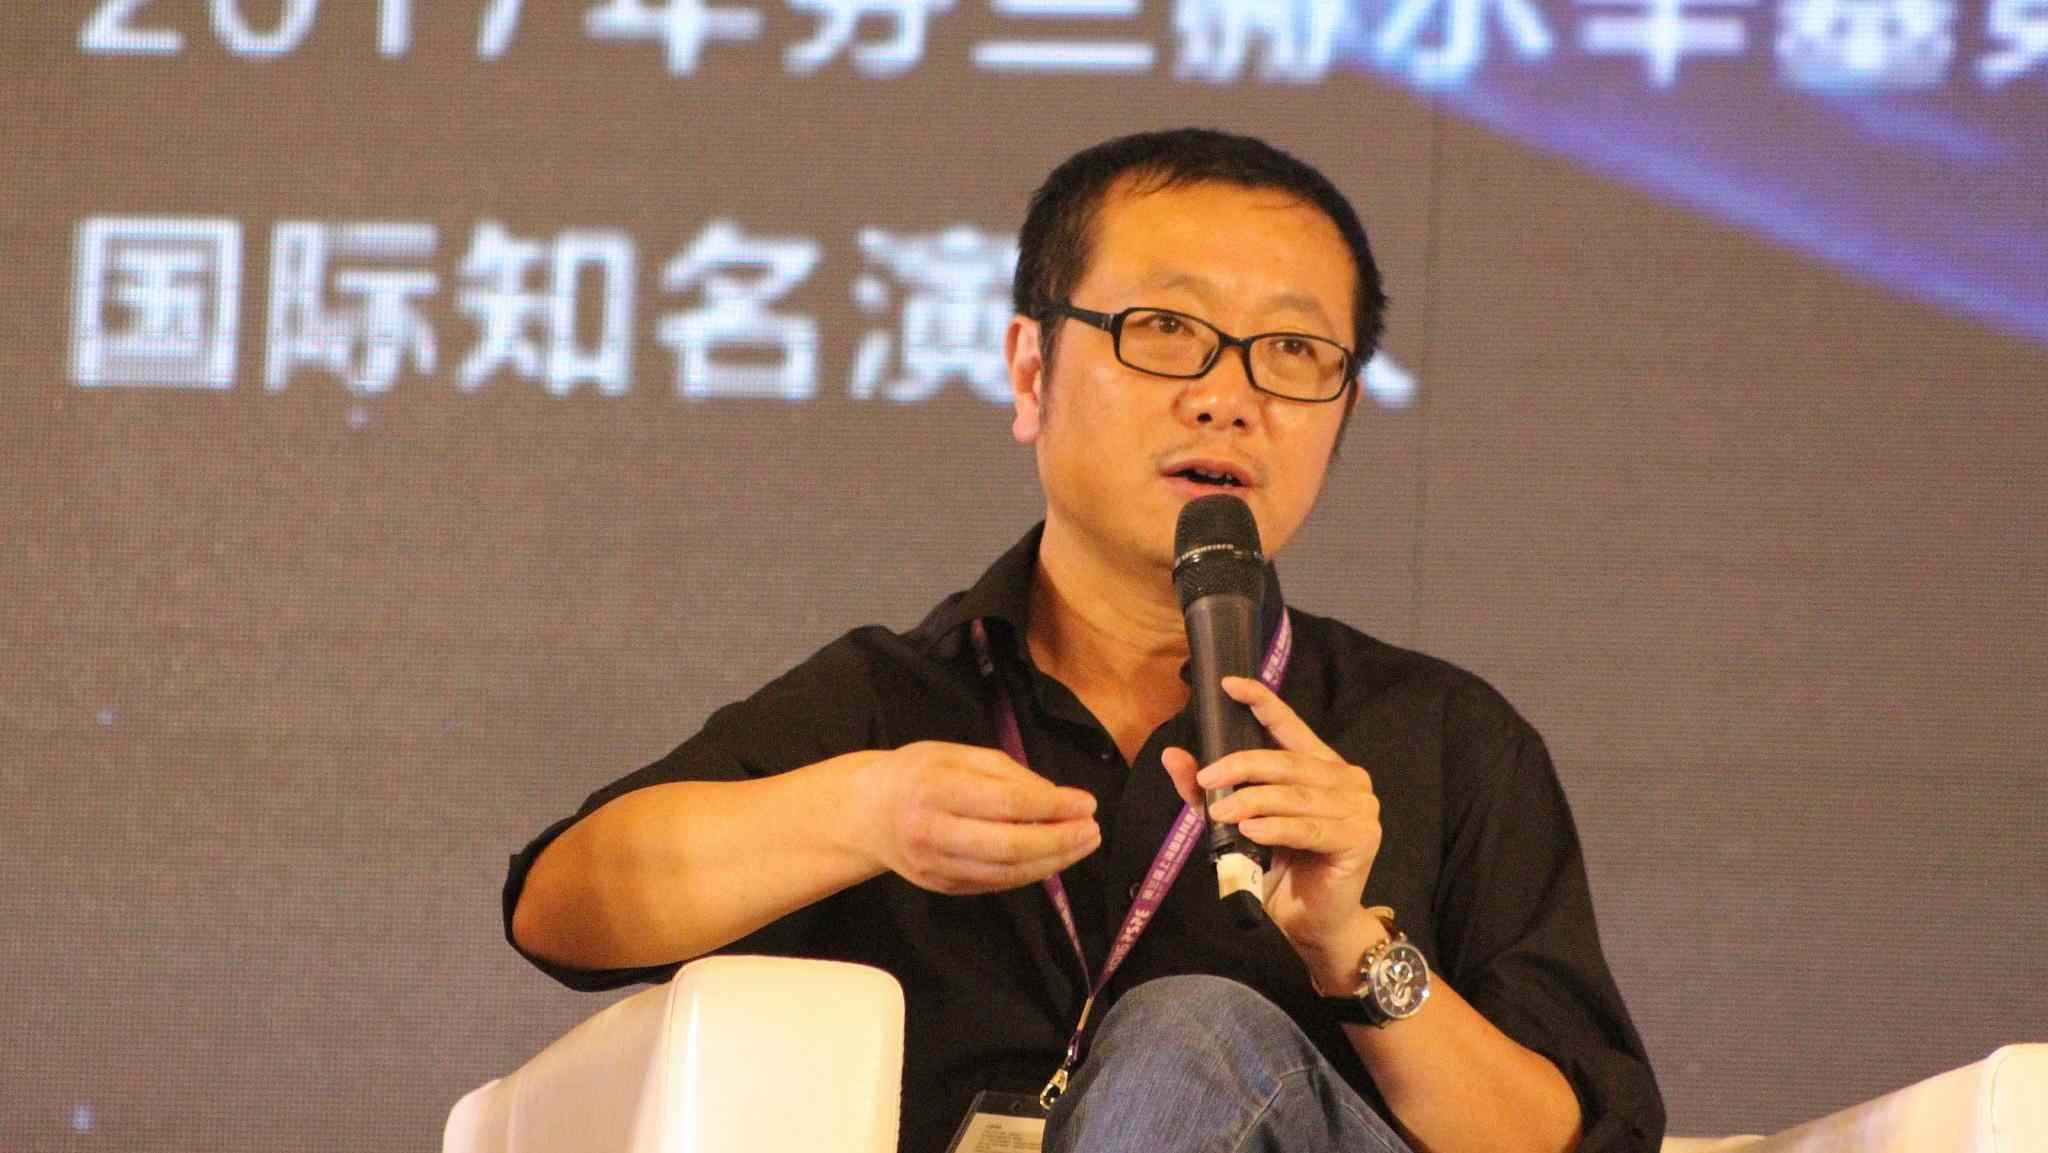 Chinese sci-fi writer Liu Cixin gets honorary degree from US Brandeis University